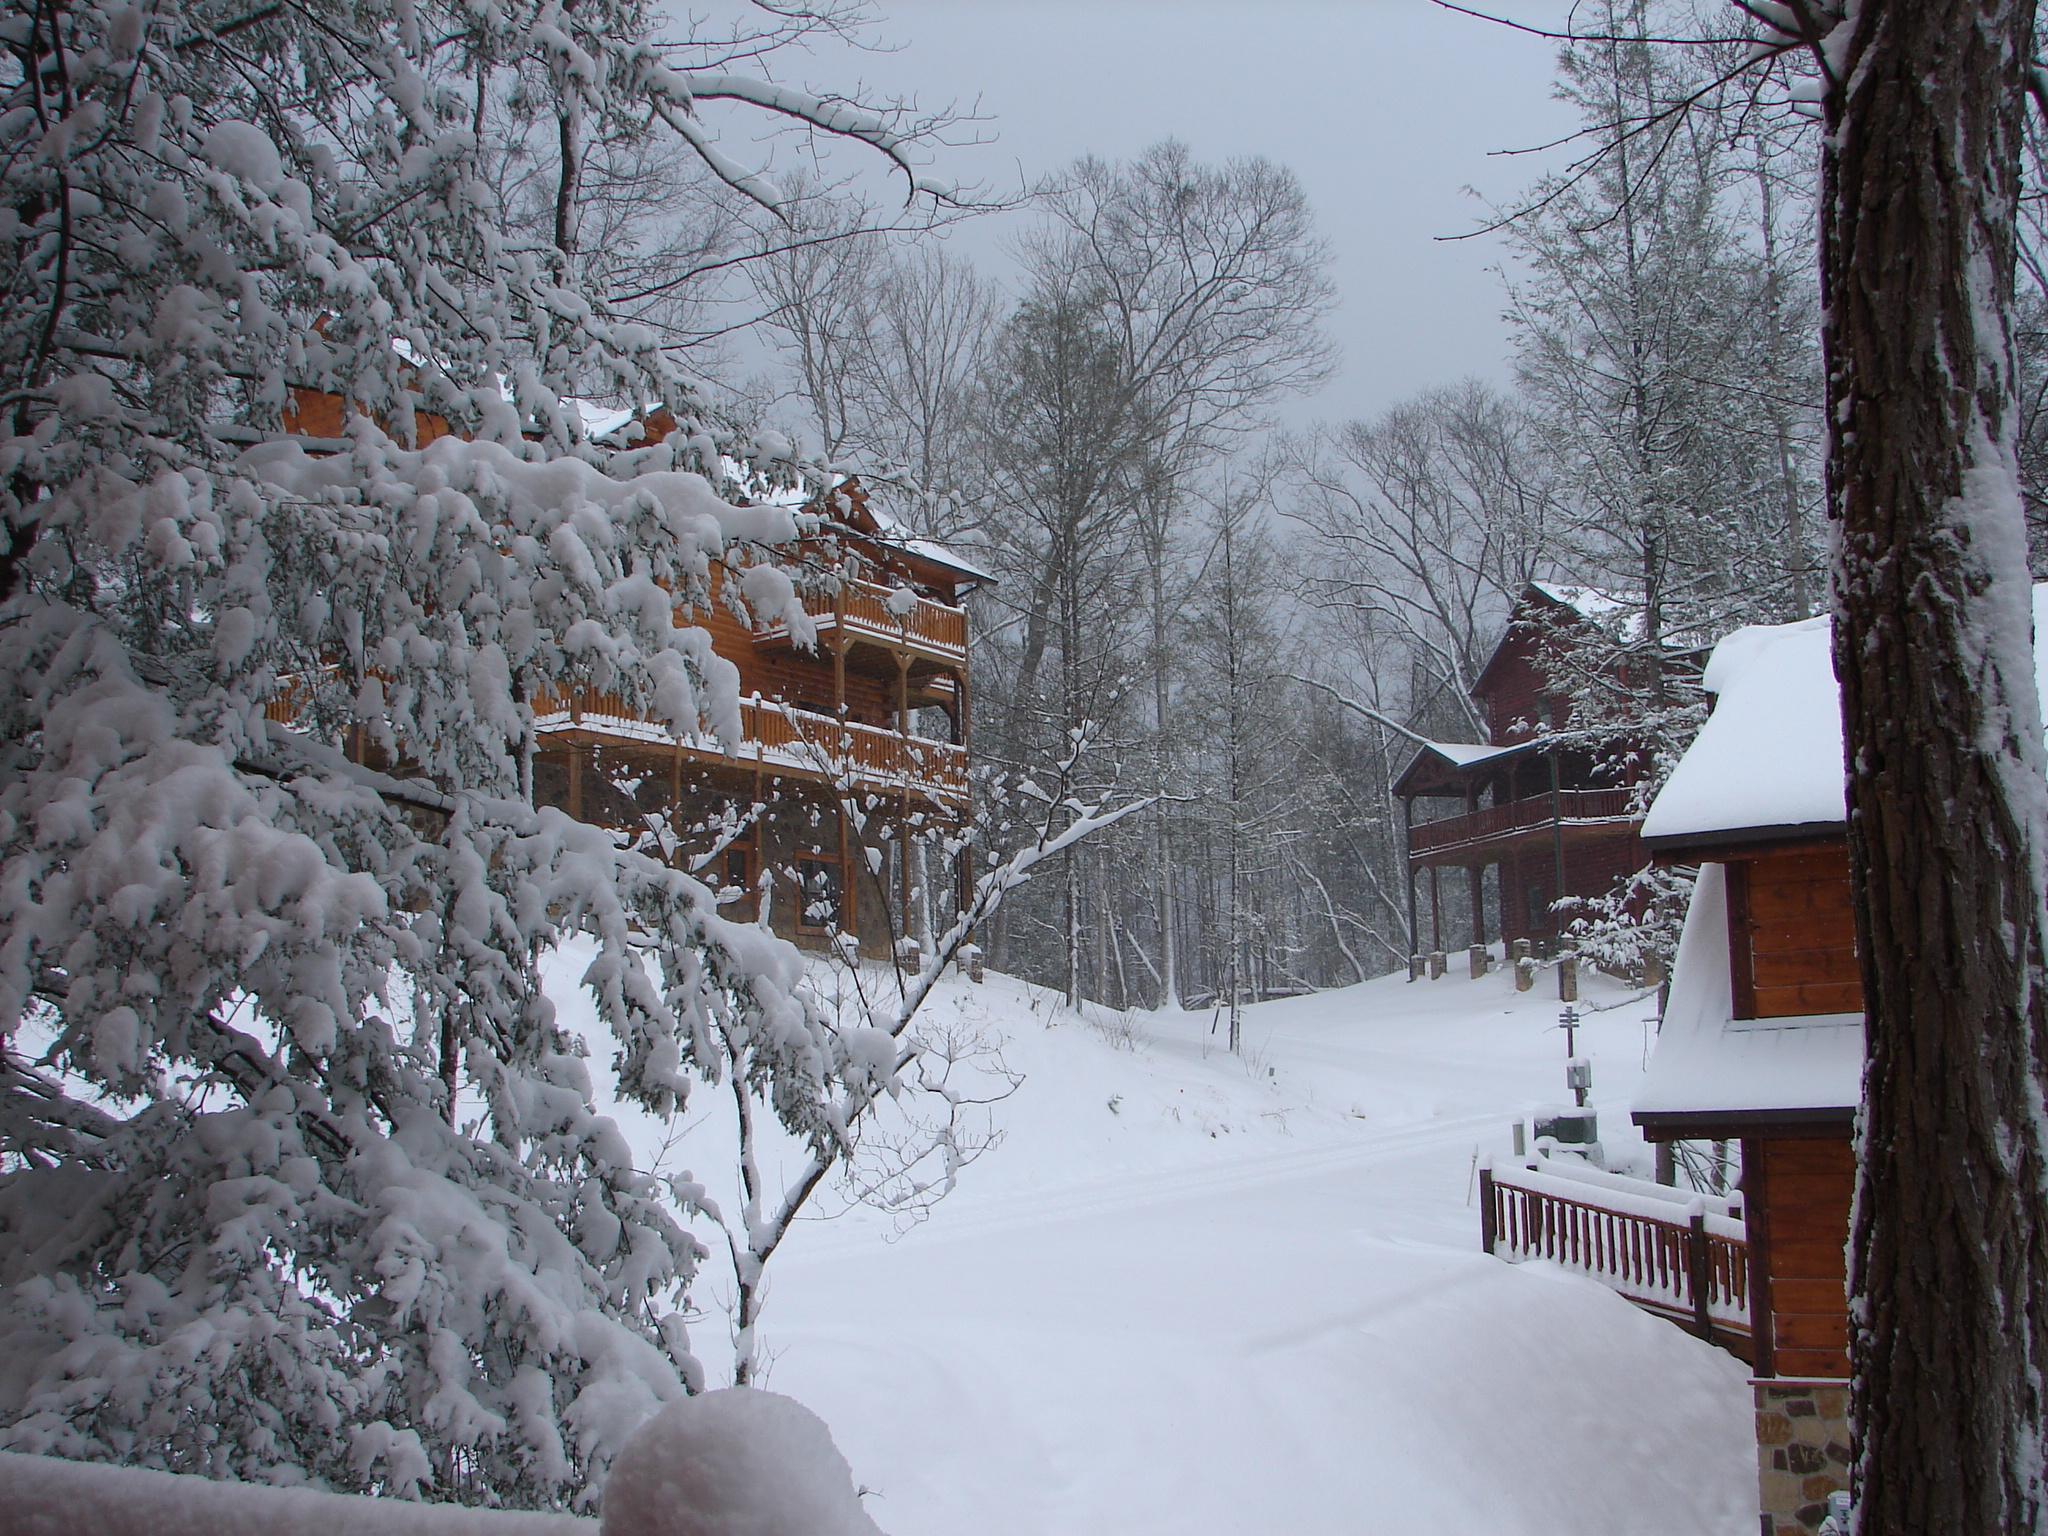 Gatlinburg Cabins - Snow